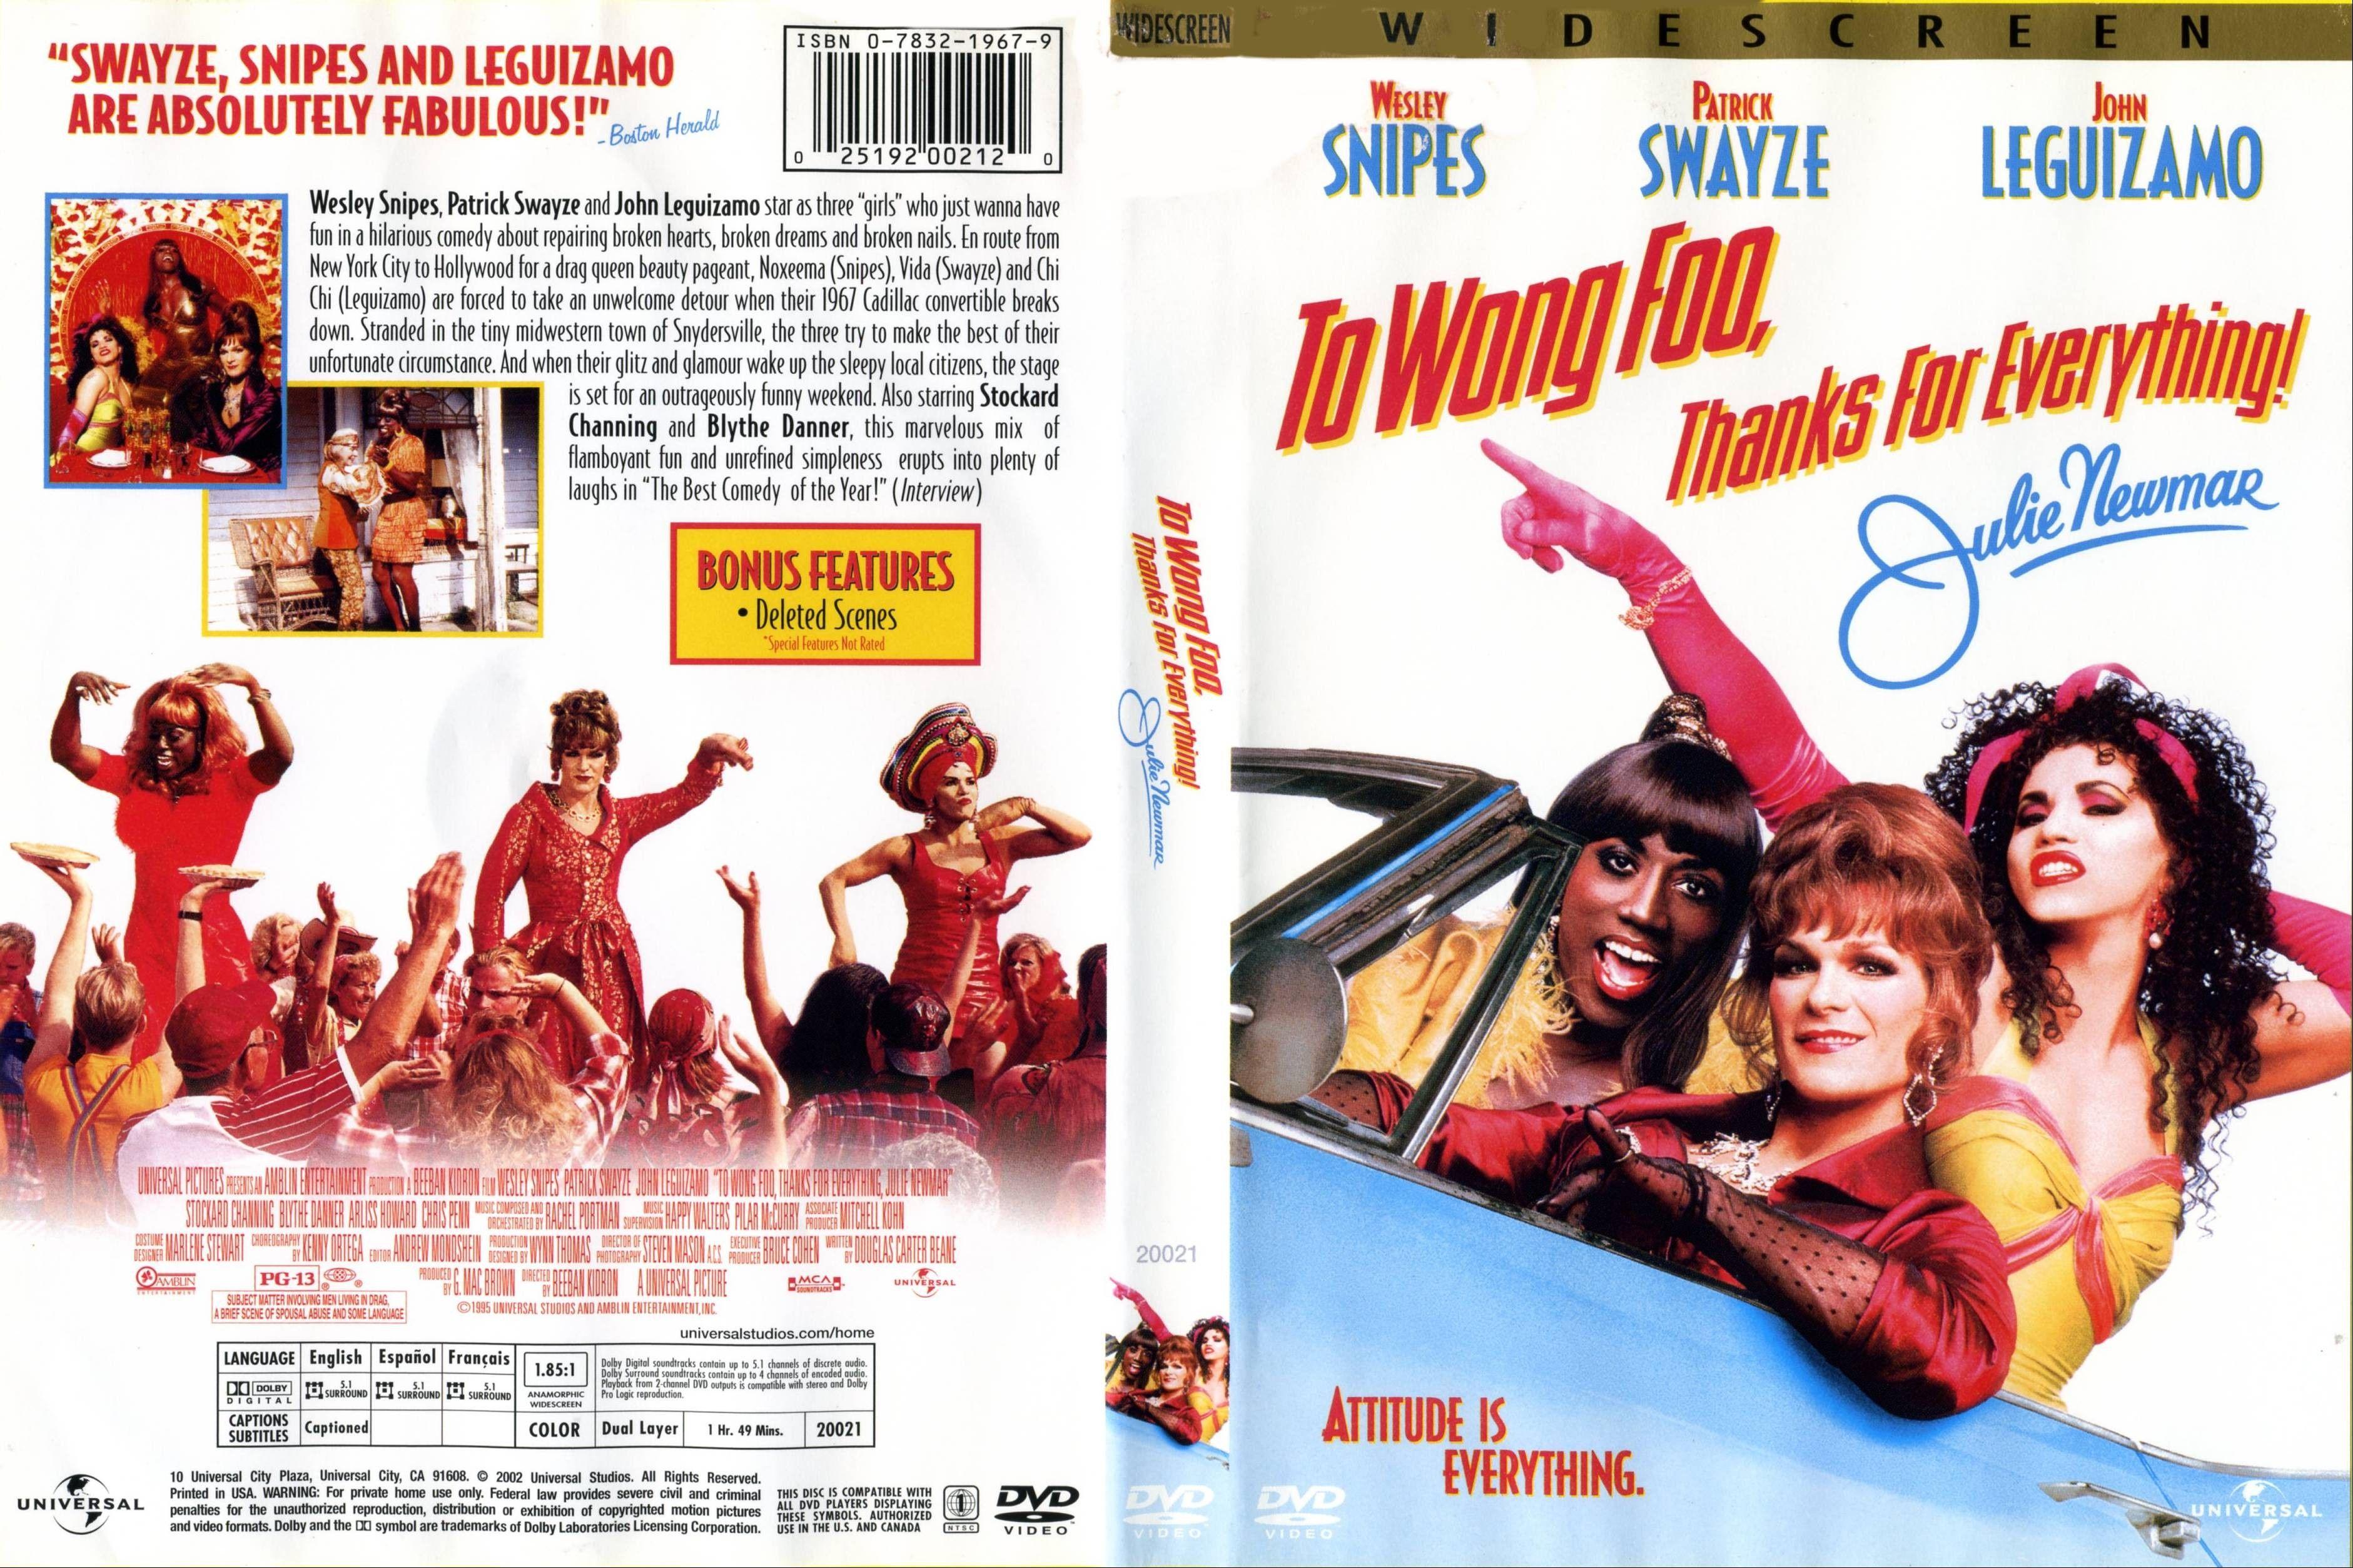 Para Wong Foo Filmes